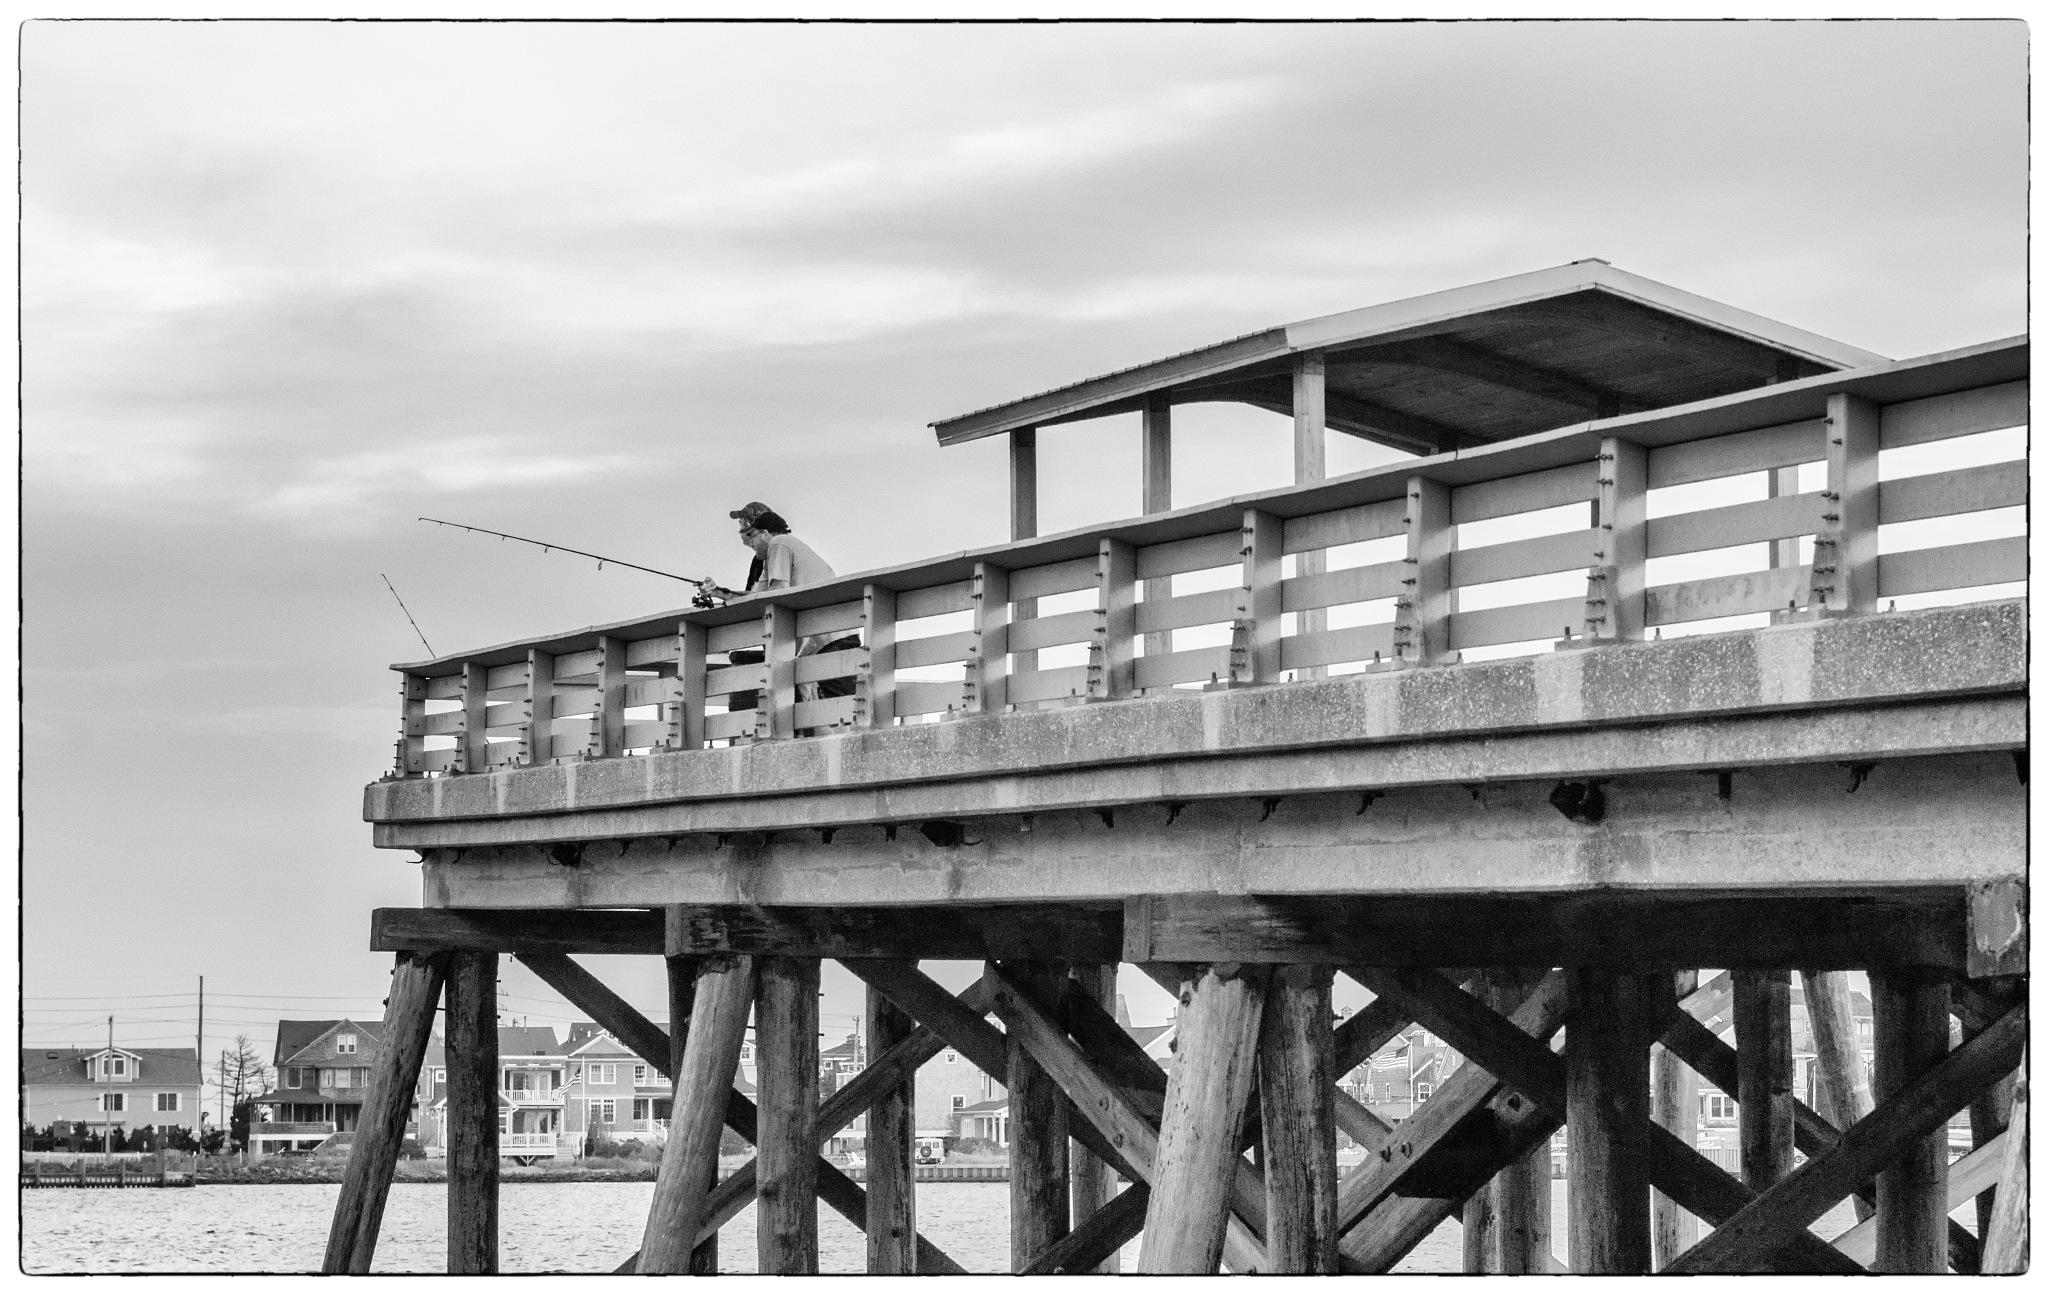 Bridge Fisherman by Edmund Dworakowski